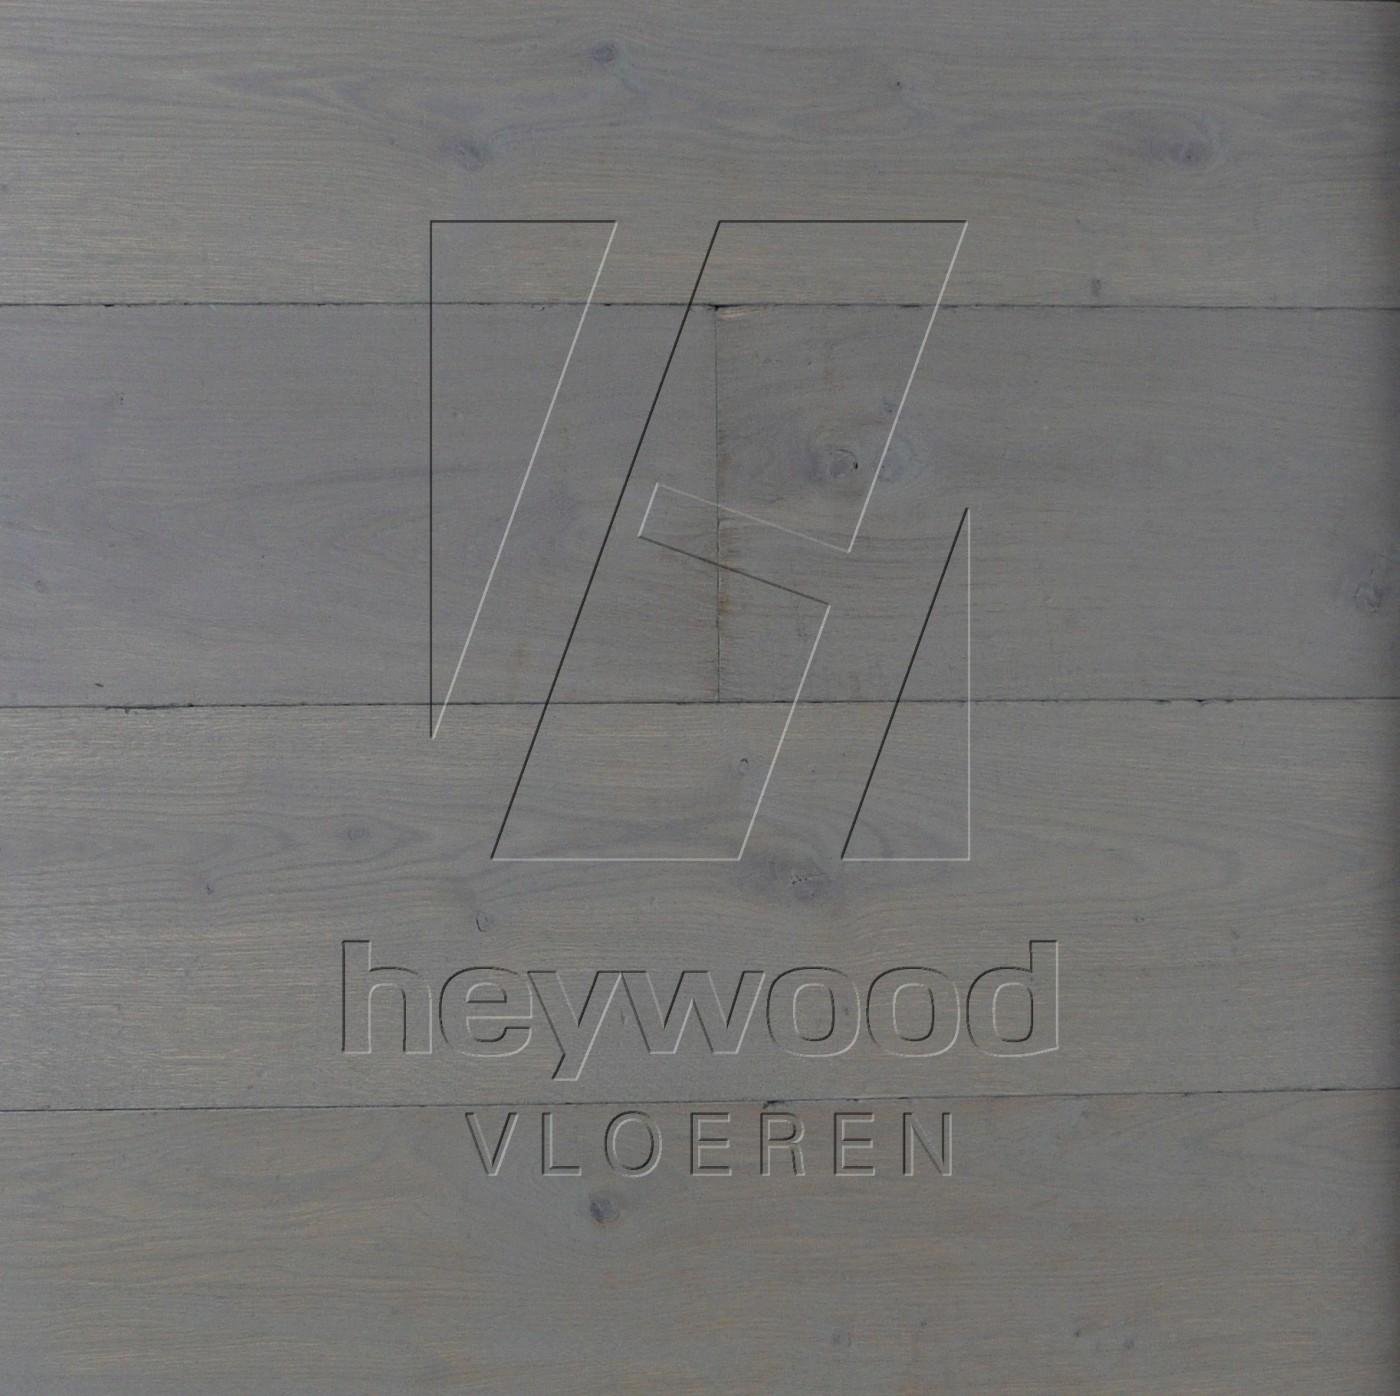 Monterrey in European Oak Character of Bespoke Wooden Floors